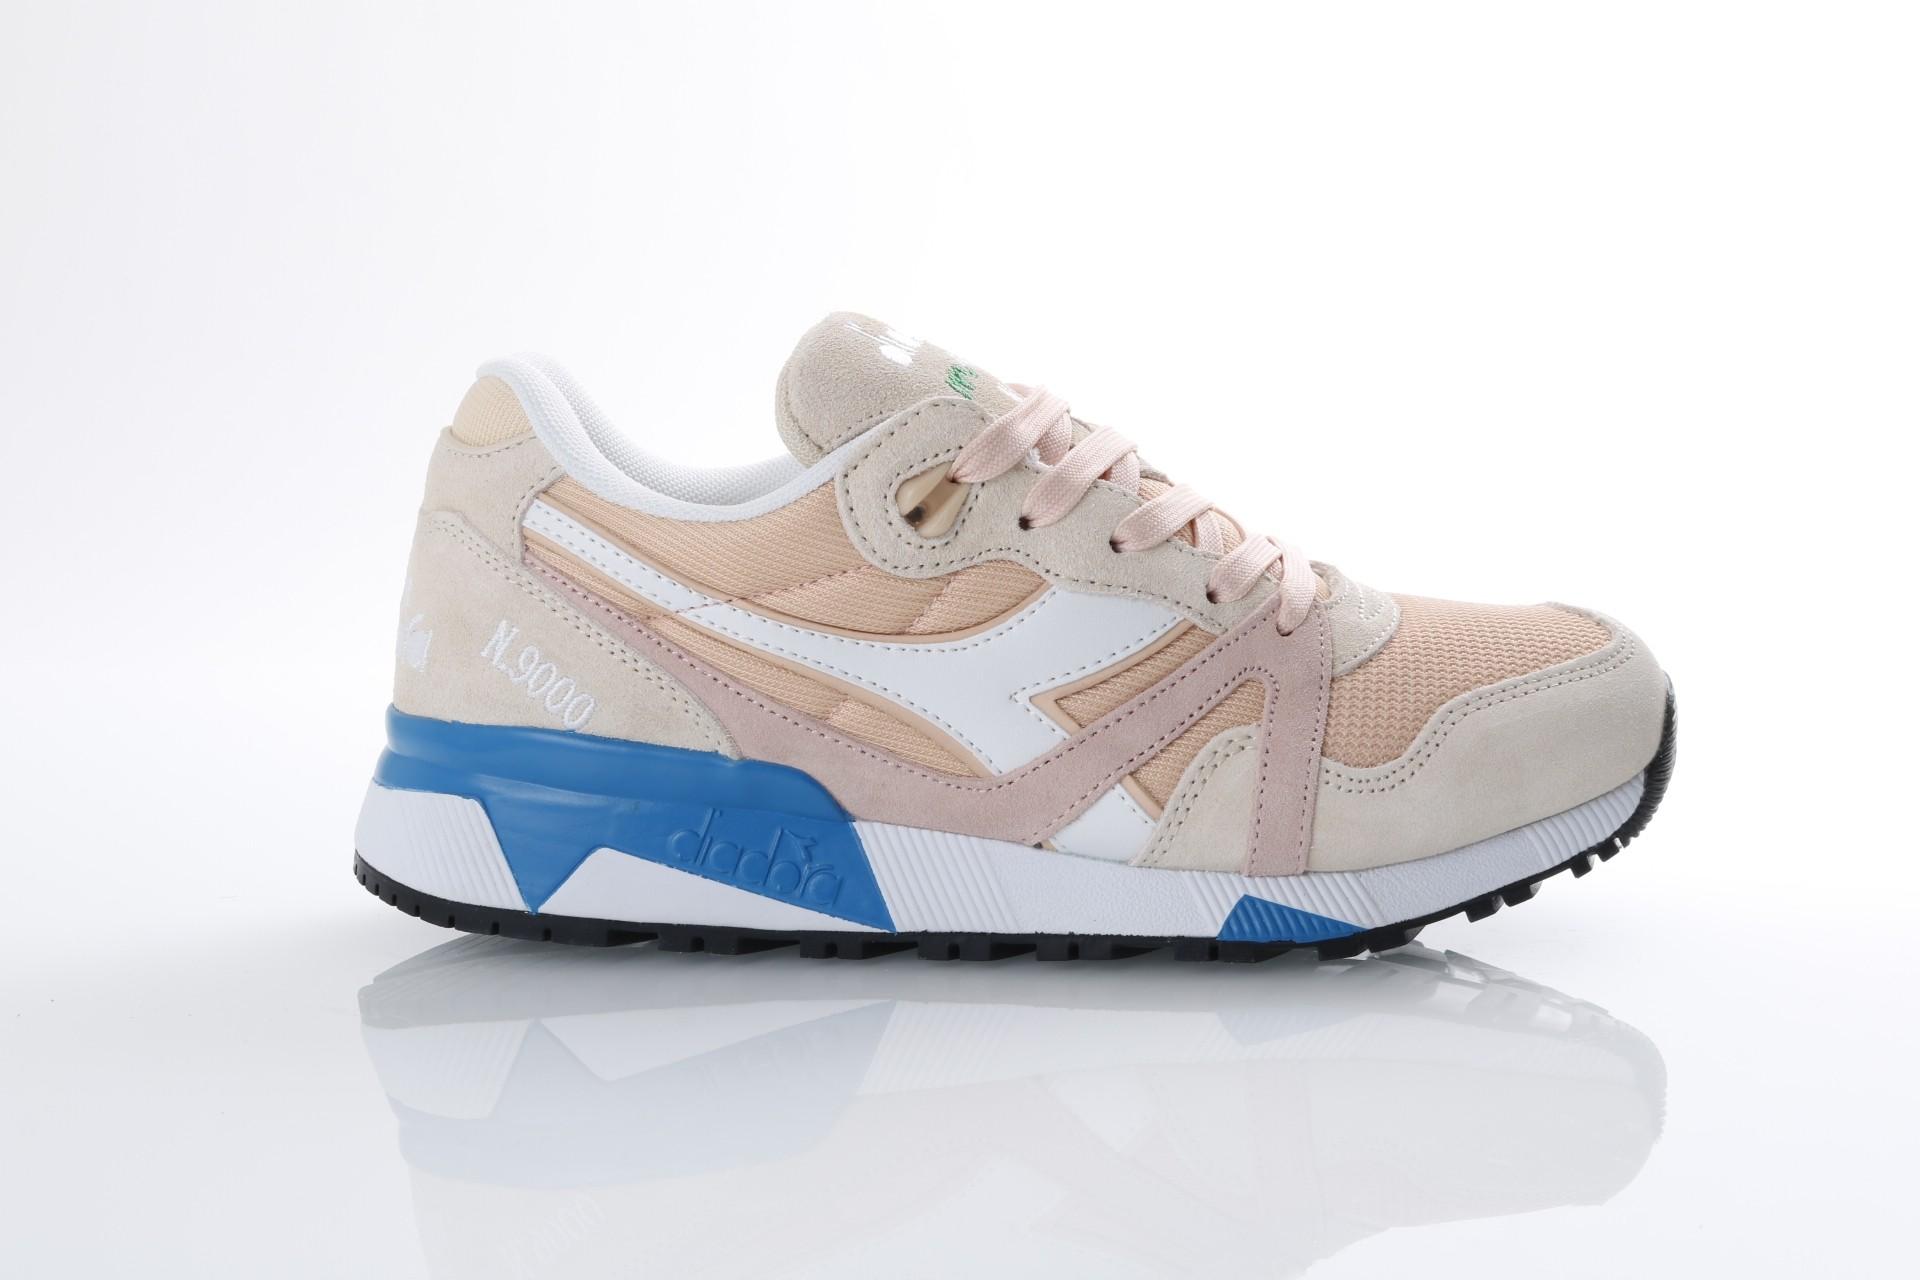 Afbeelding van Diadora 501.171.853-C7376 Sneakers N9000 III Bisque/bleached sand/vivid blu